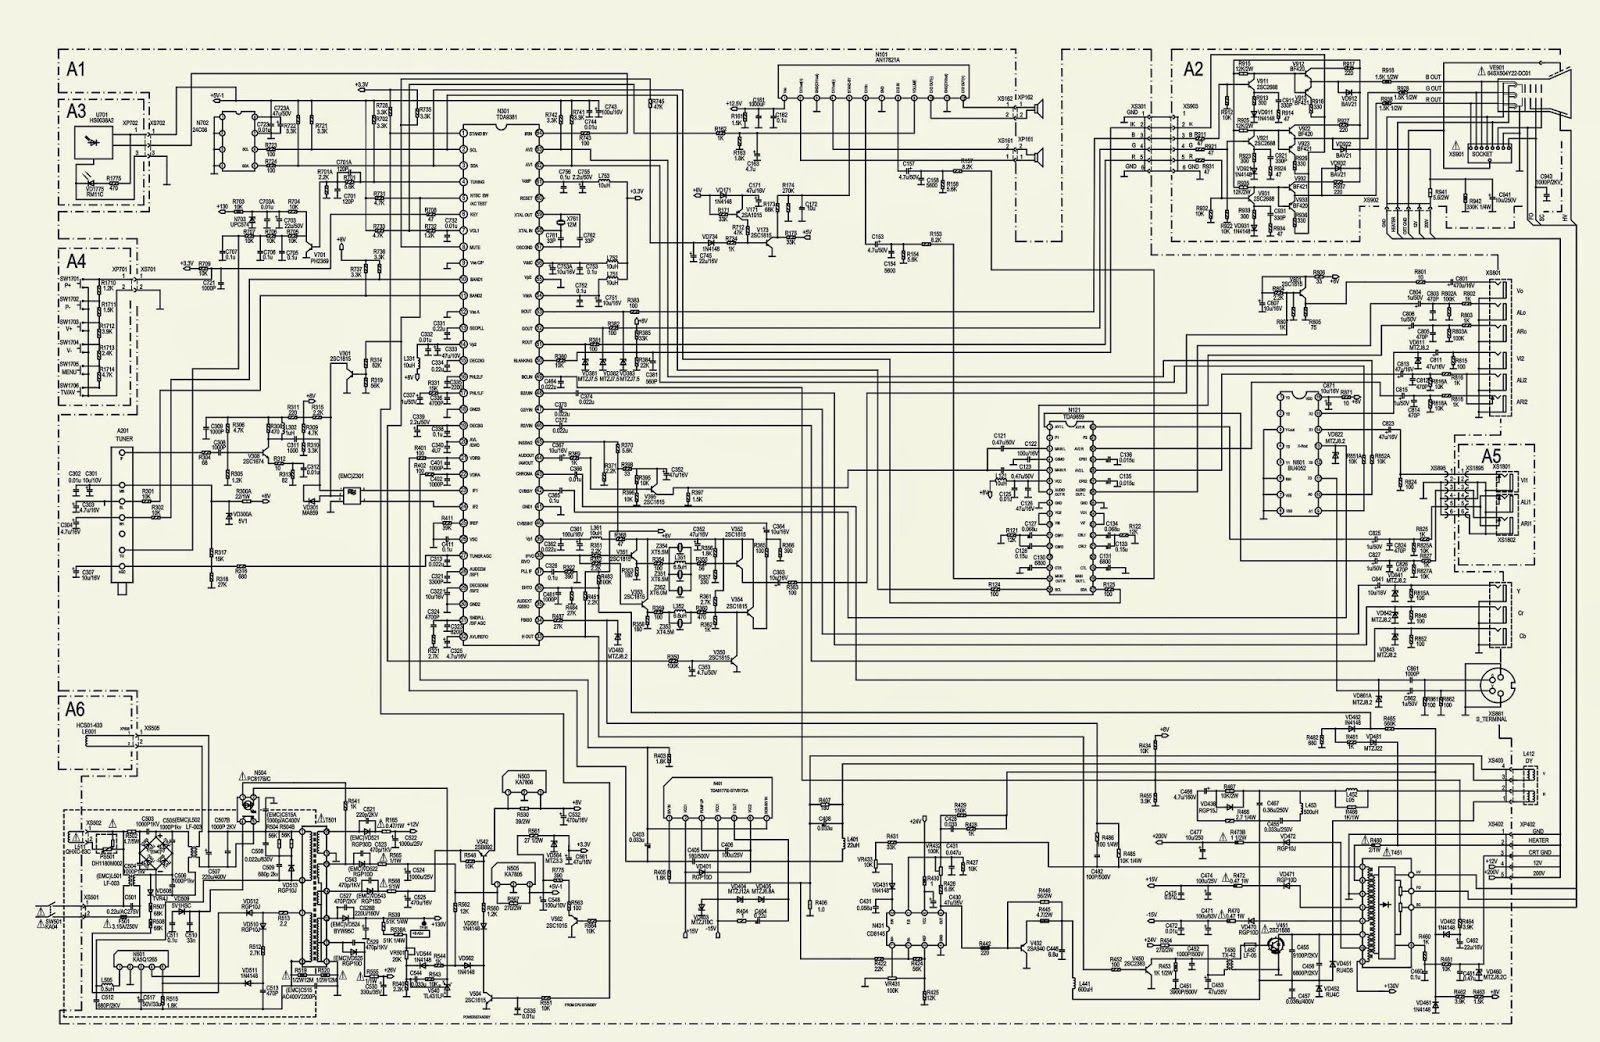 Akai Tv Schematic Diagram Trusted Wiring Diagrams Skema Samsung Ln26b350f1 Ln32b350f1 Tft Lcd Circuit Auto Electrical U2022 Ge